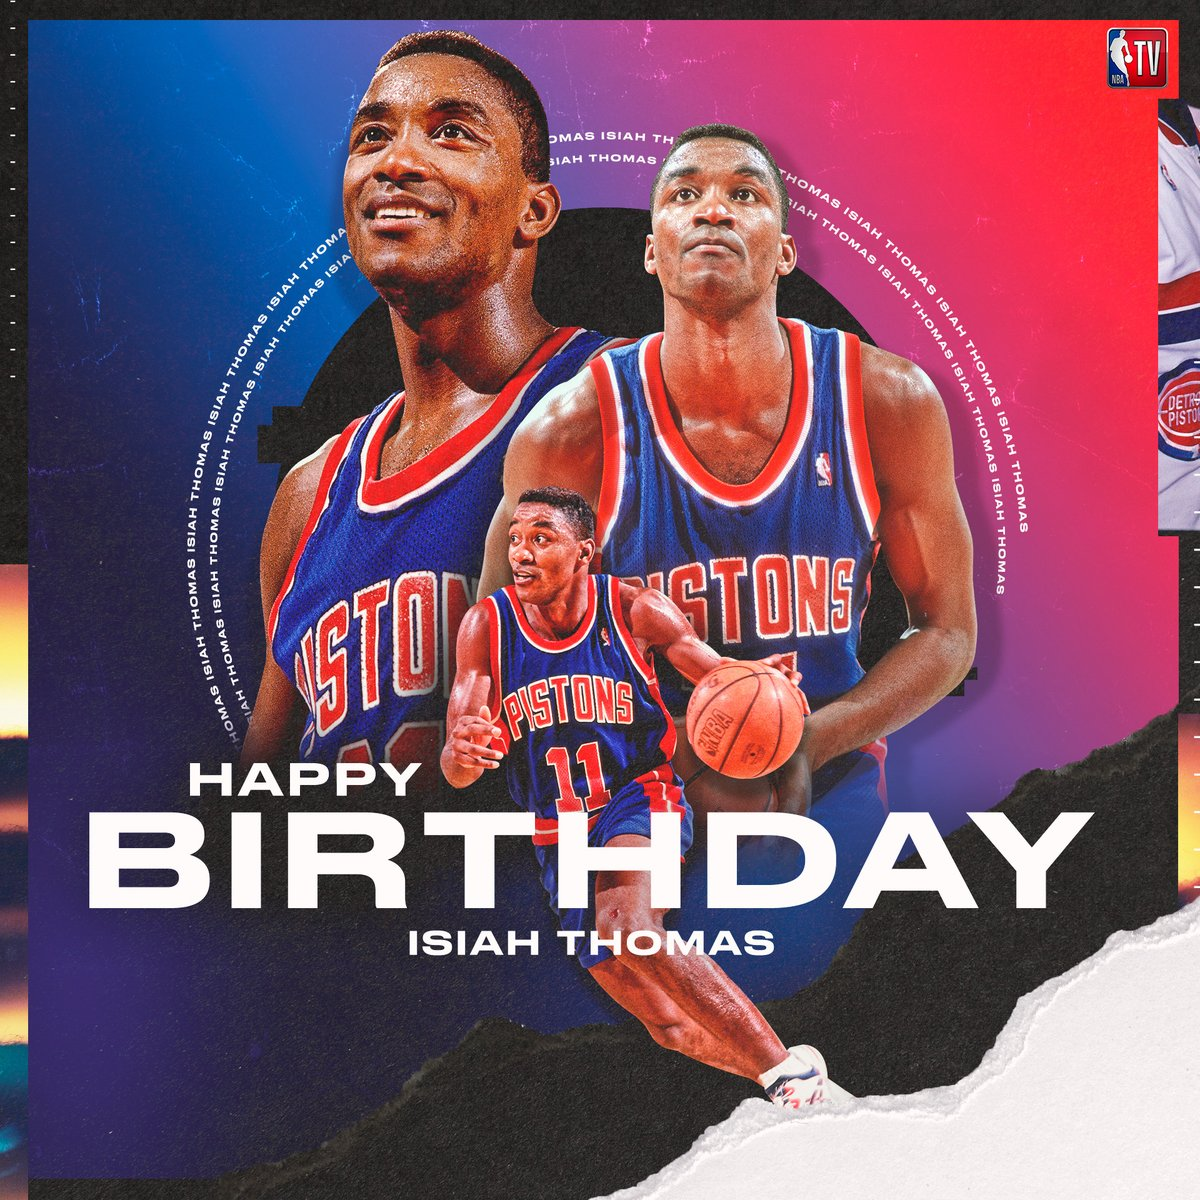 NBA官方为名宿送上祝福 微笑刺客59岁生日快乐